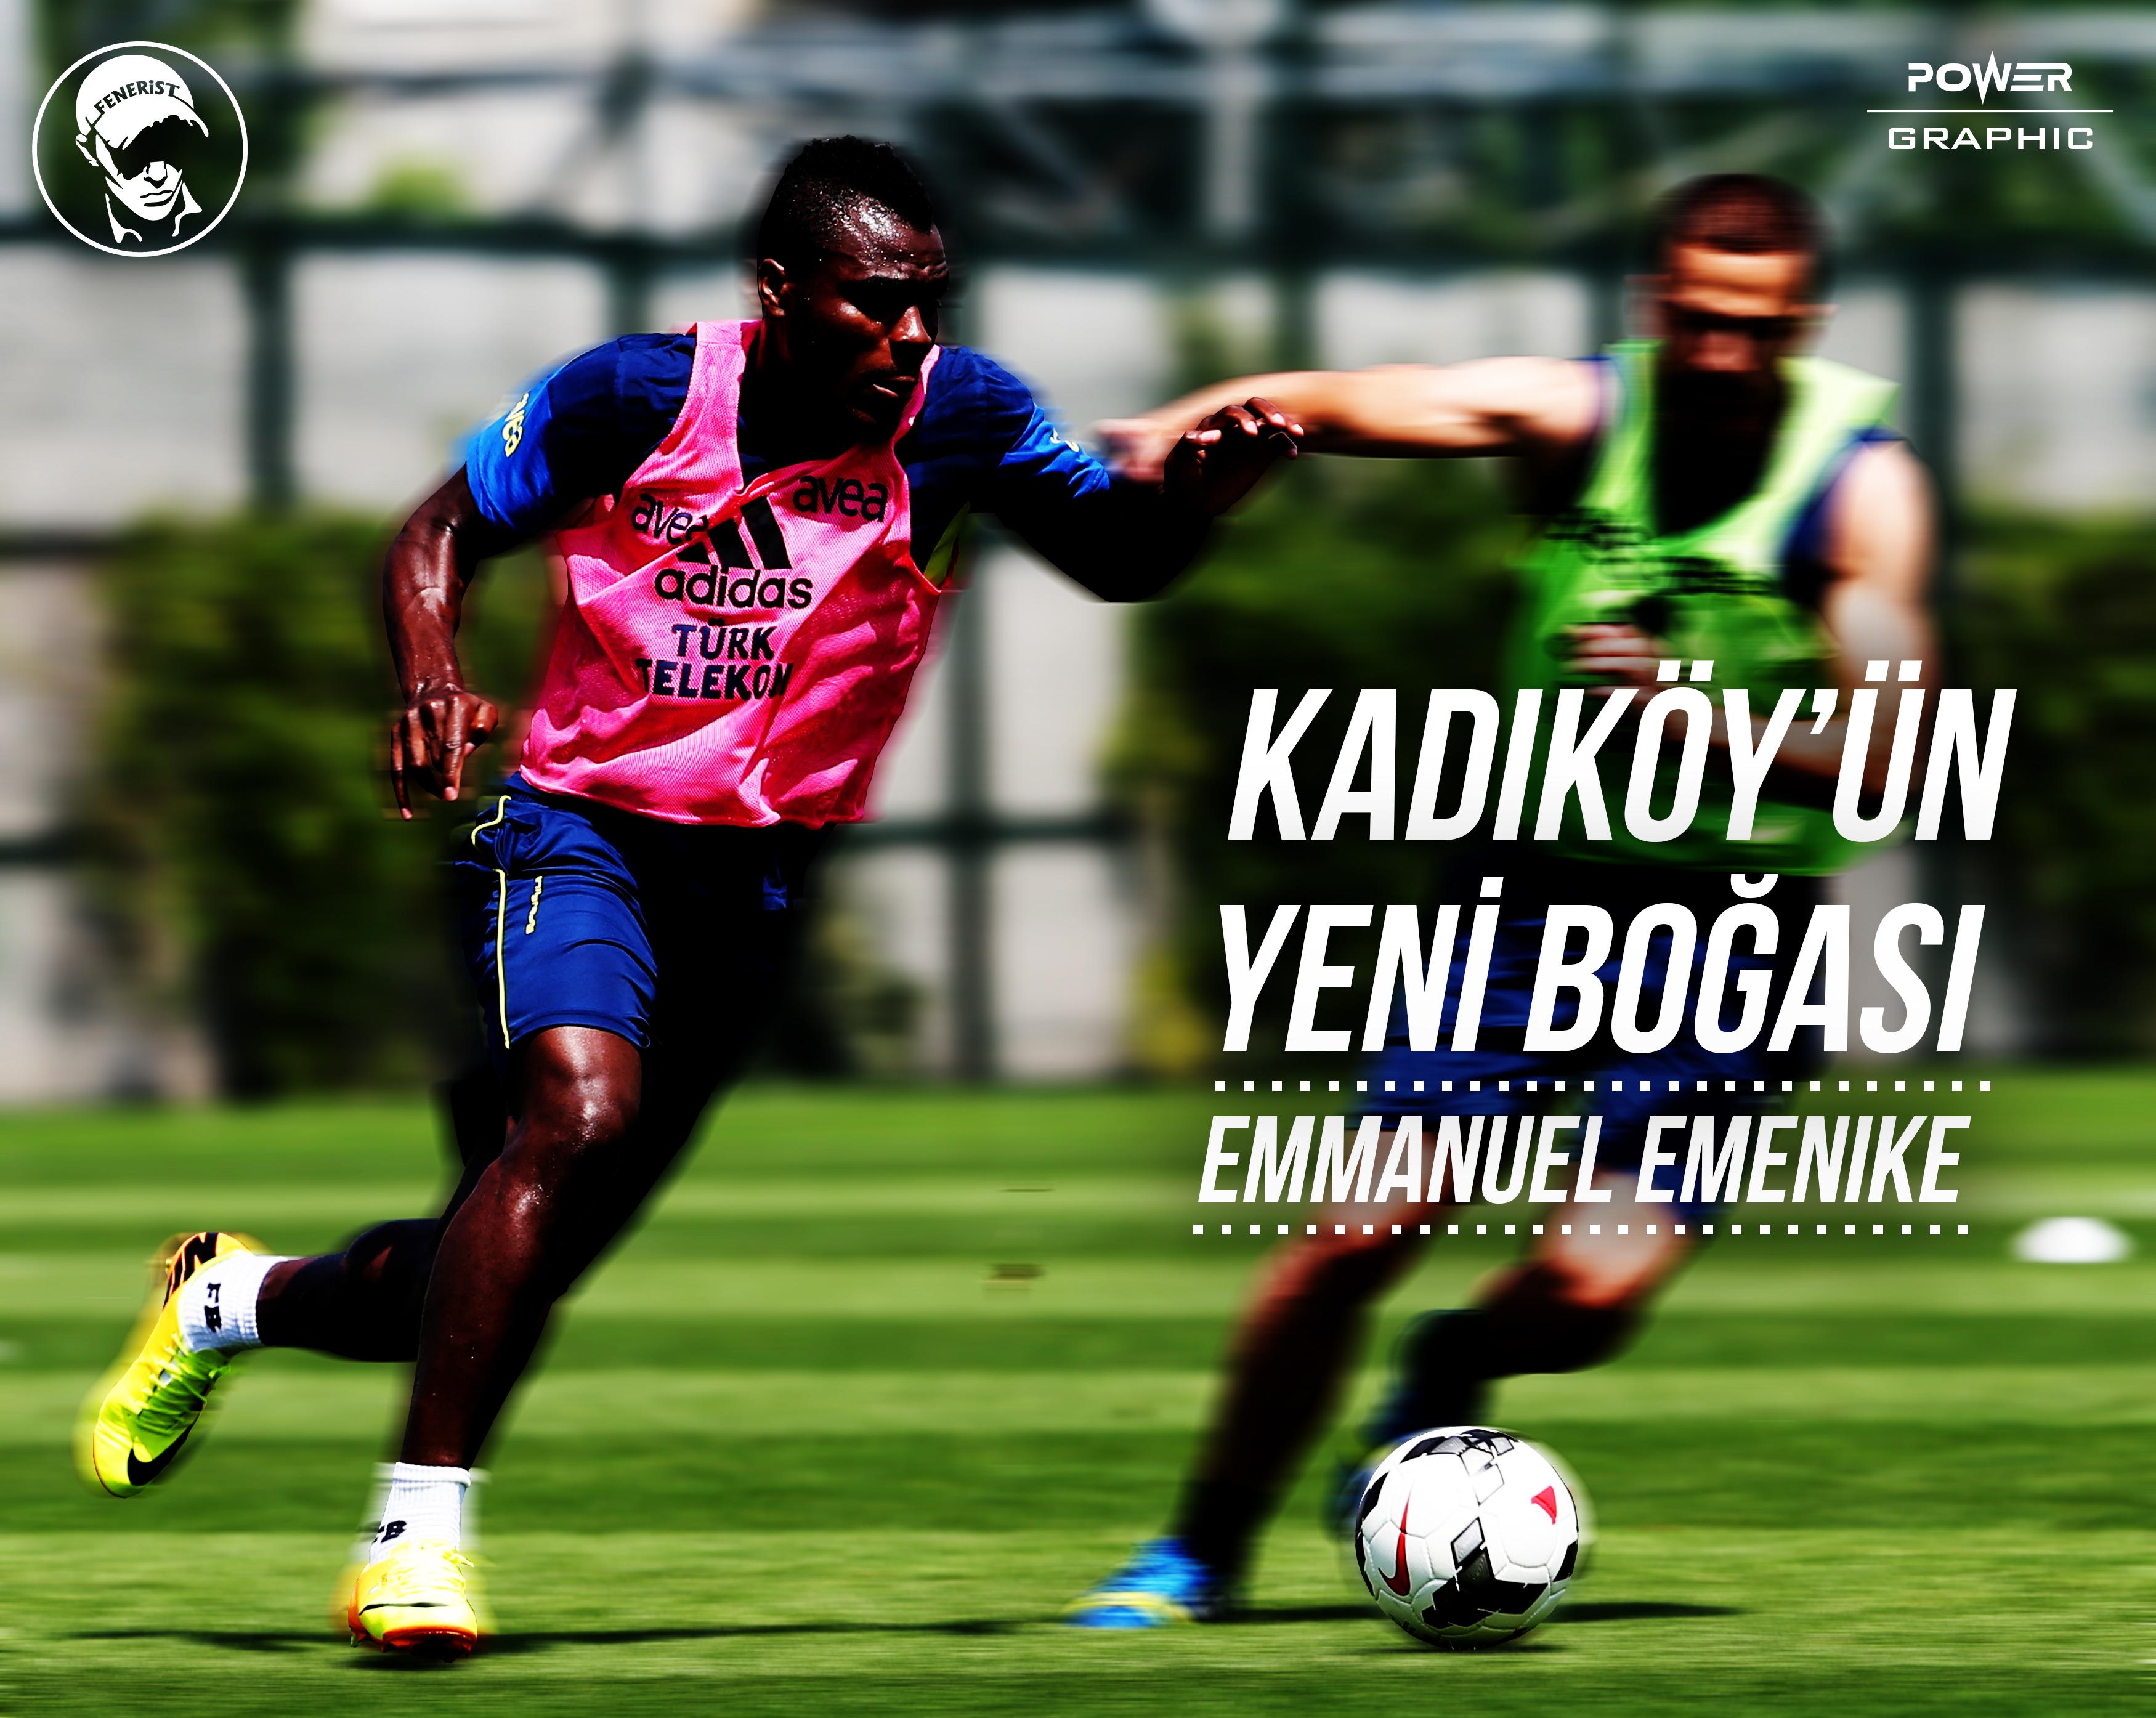 Kadikoy un Yeni Bogasi Emmanuel Emenike by Power Graphic on